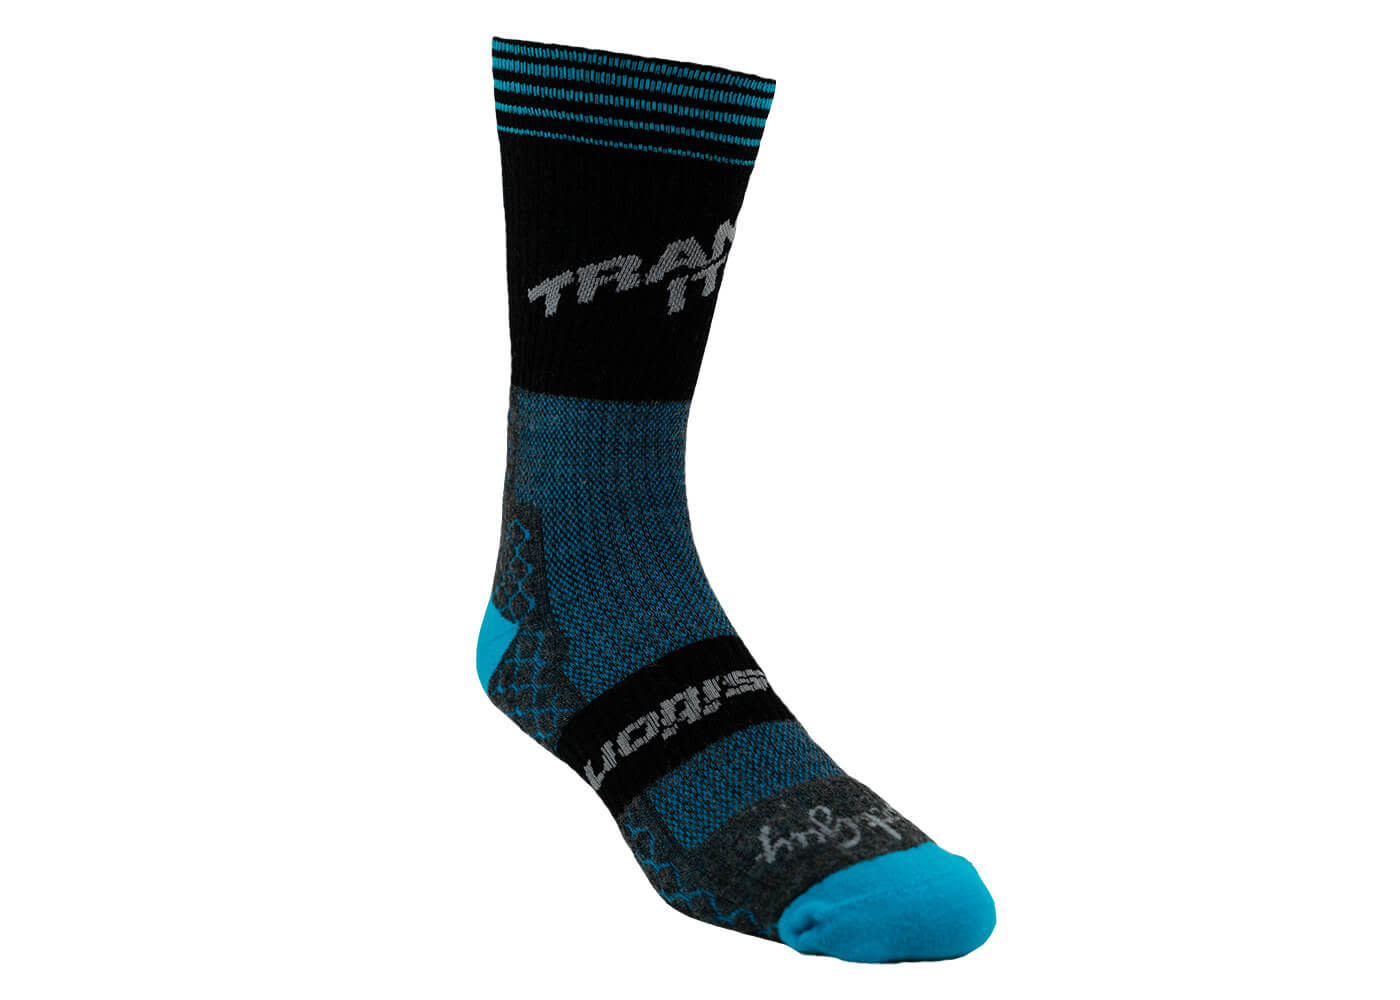 Transition TBC - Wool Winter Socks (Transition Logo, Black/Blue)